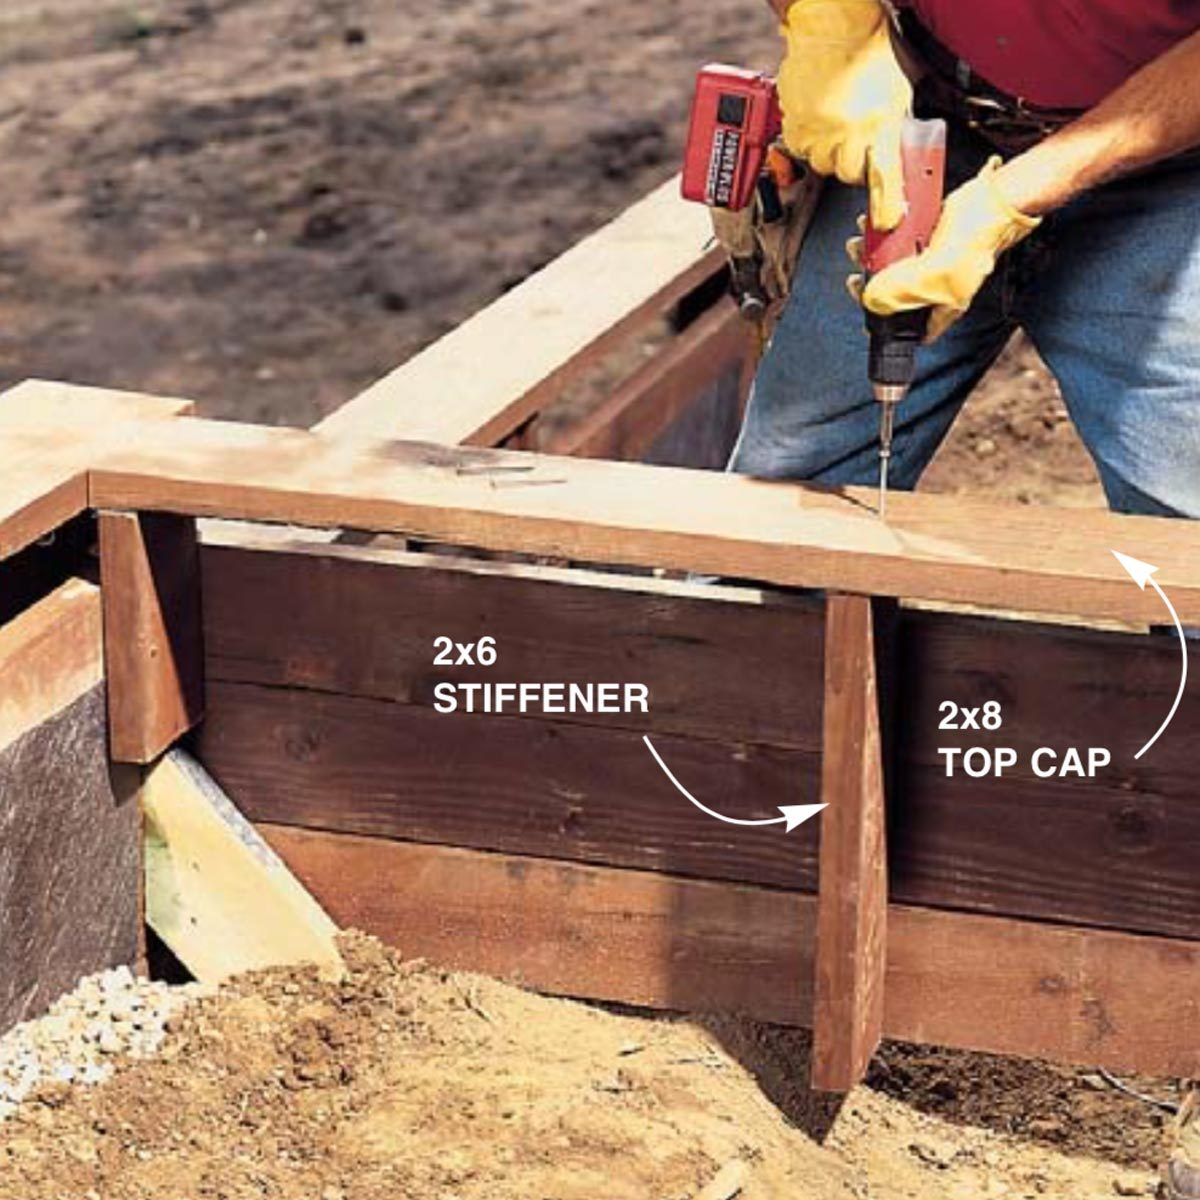 How to Build a Treated Wood Retaining Wall | Family Handyman